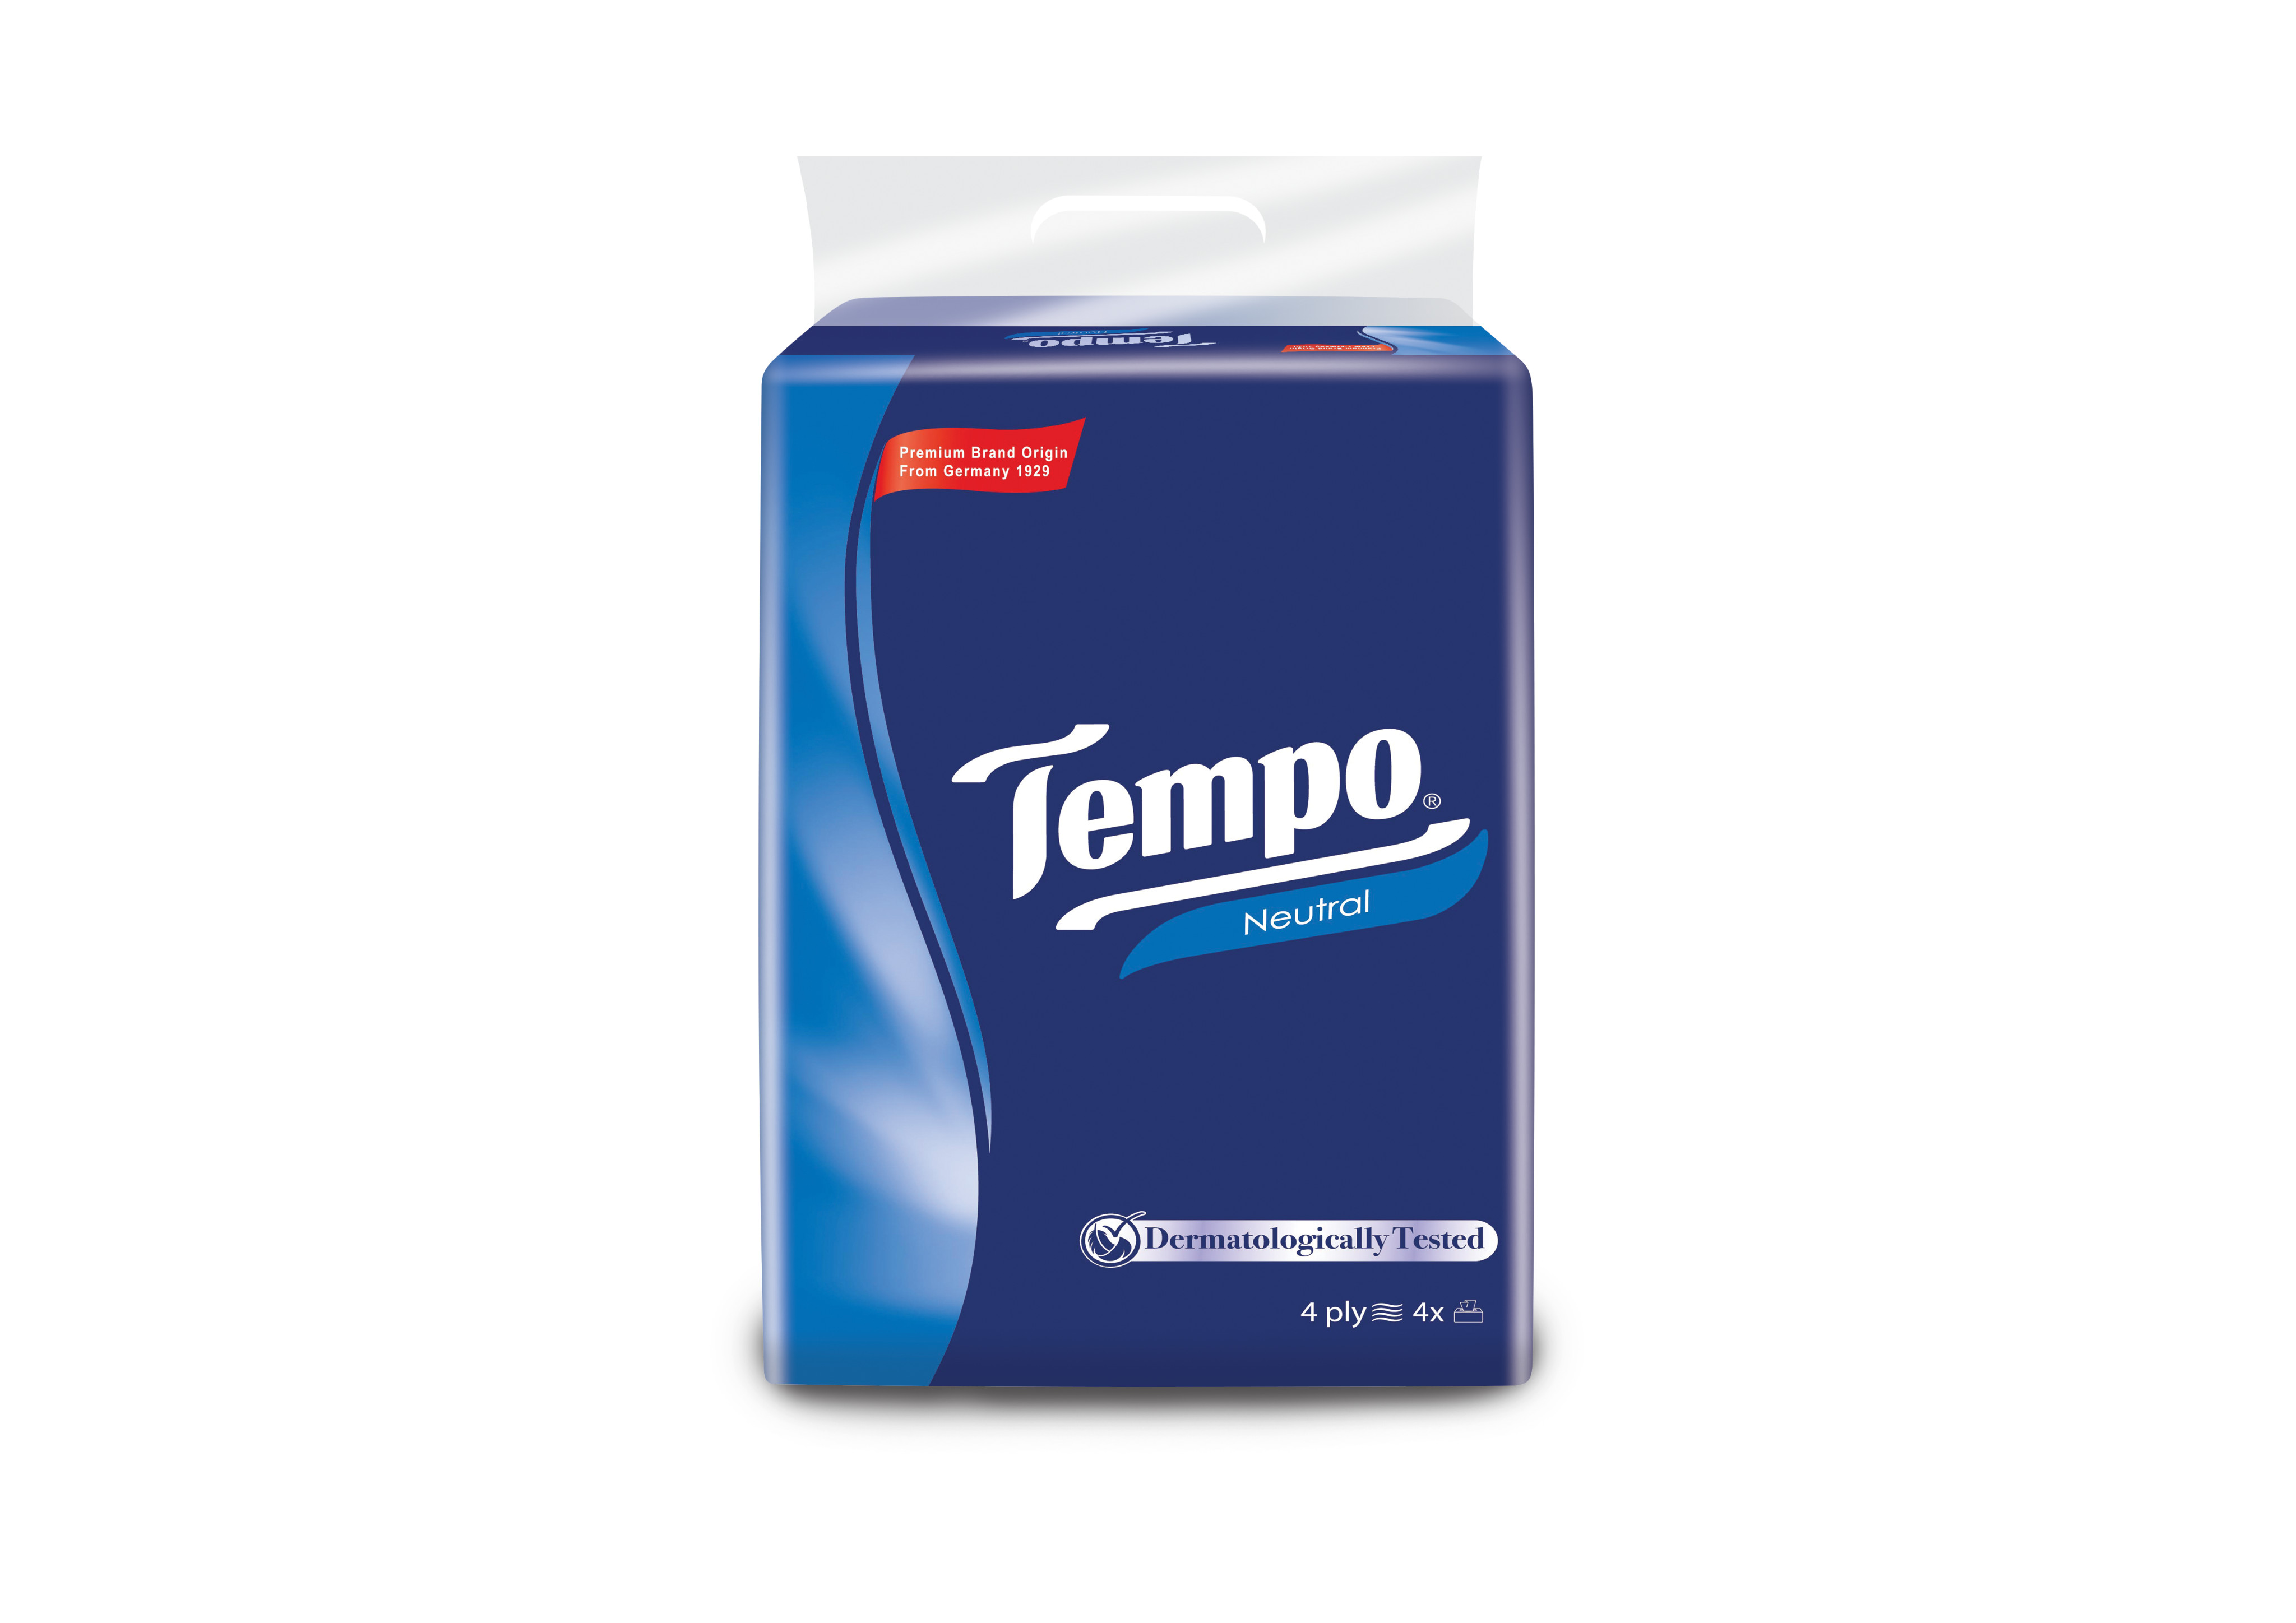 khăn rút Tempo 4 lớp 4 gói neutral